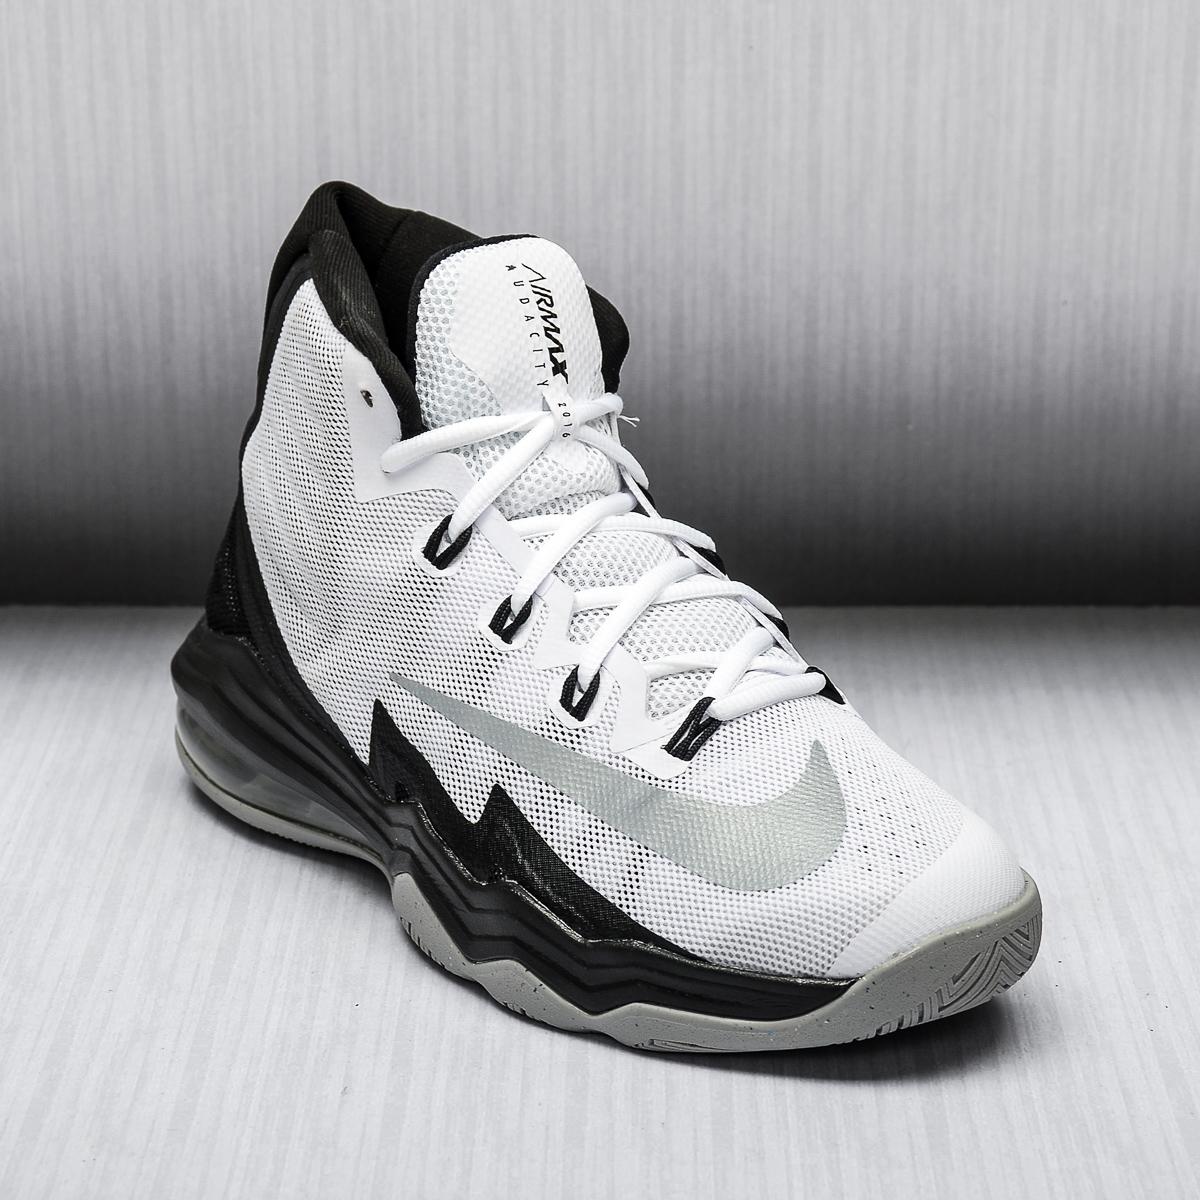 Nike Air Max 2016 Basketball Shoes